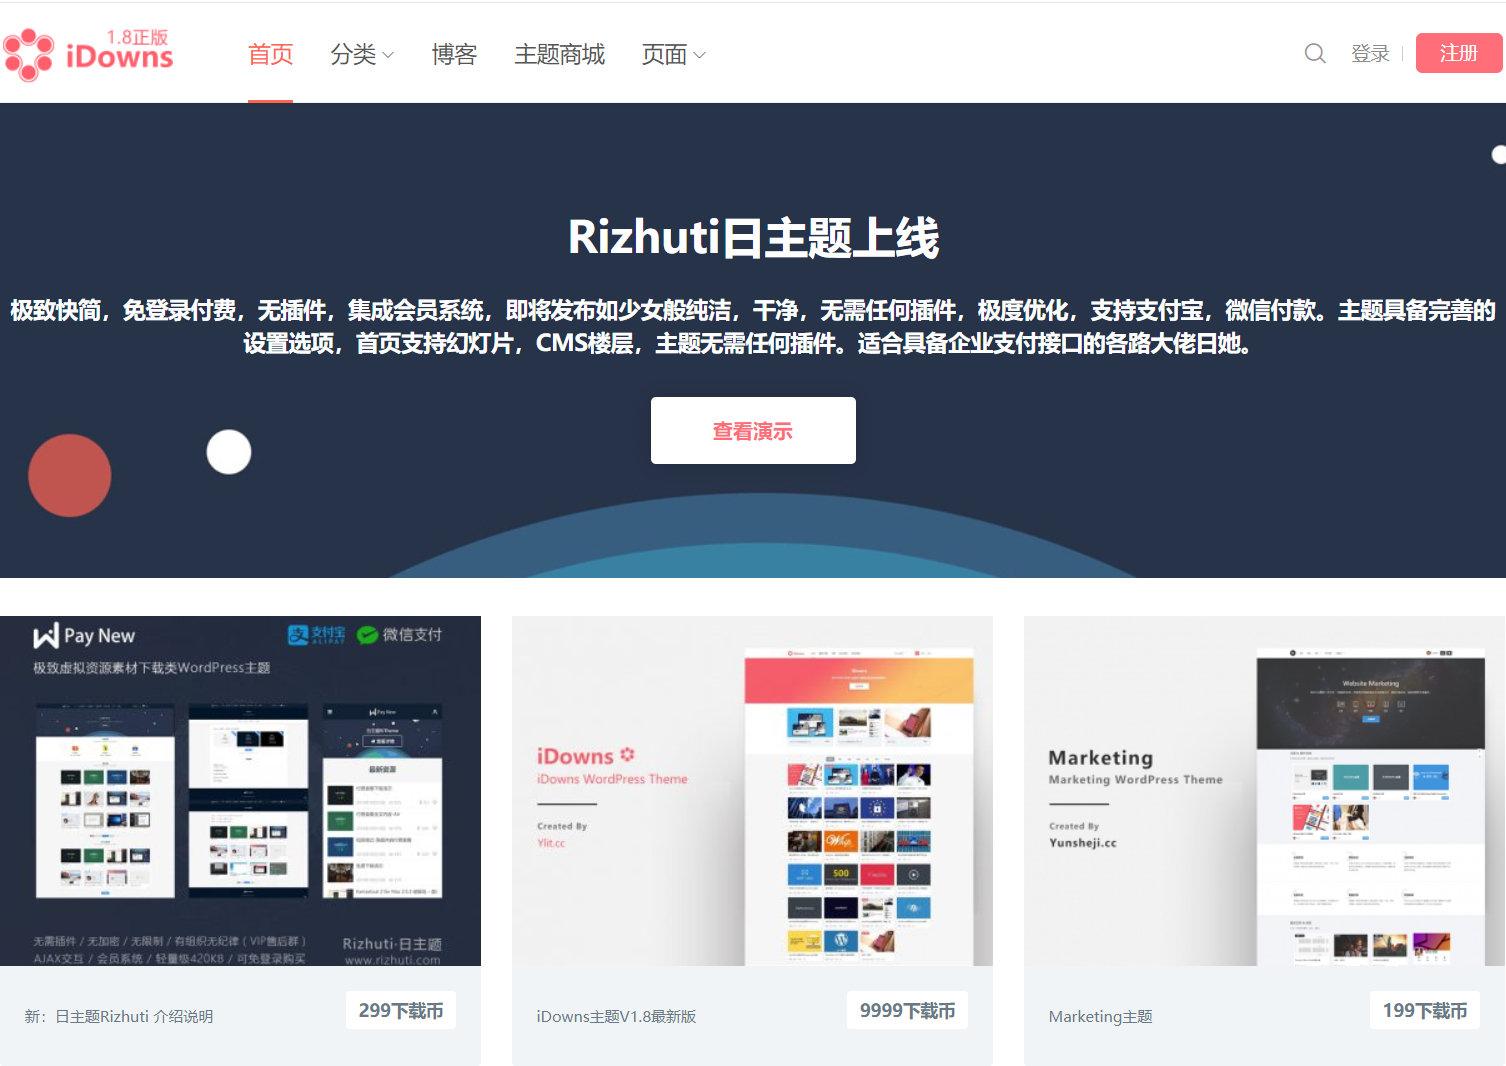 VPSCHE WordPress主题# rizhuti V2.6 & iDownsV1.8.4 & Marketing 免费体验 https://www.vpsche.com